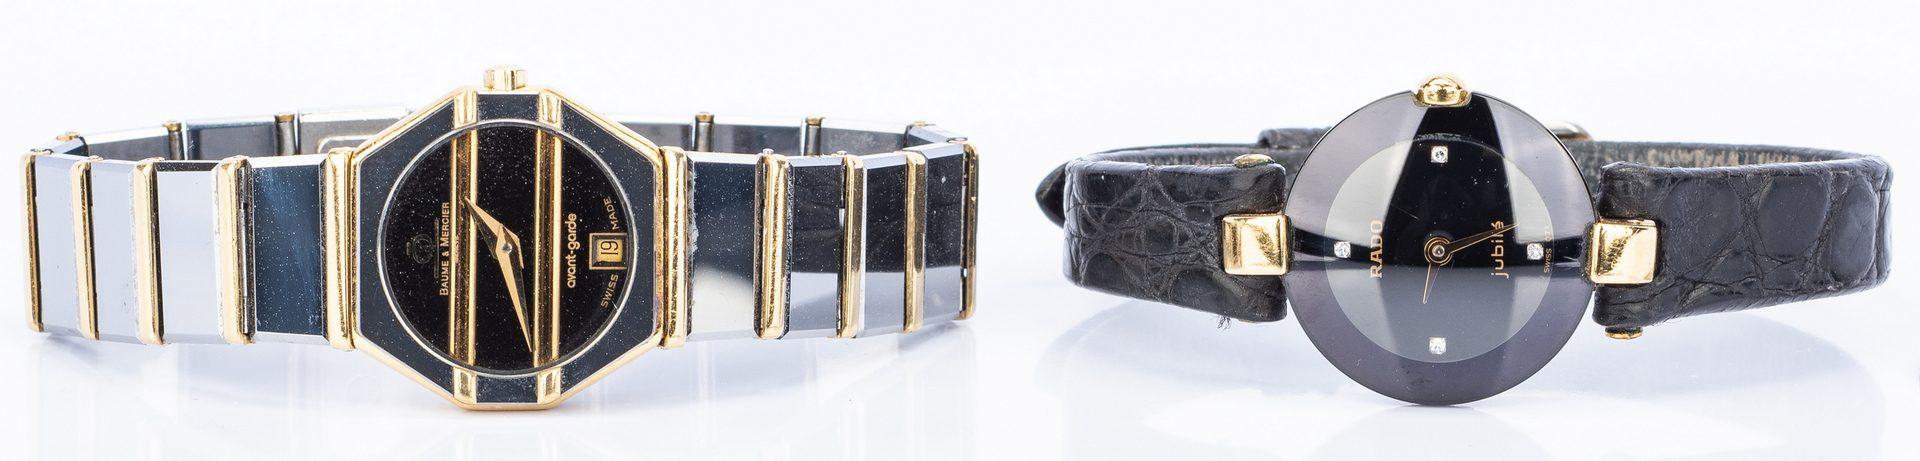 Lot 148: Lady's Baume & Mercier & RADO Watches, 2 items